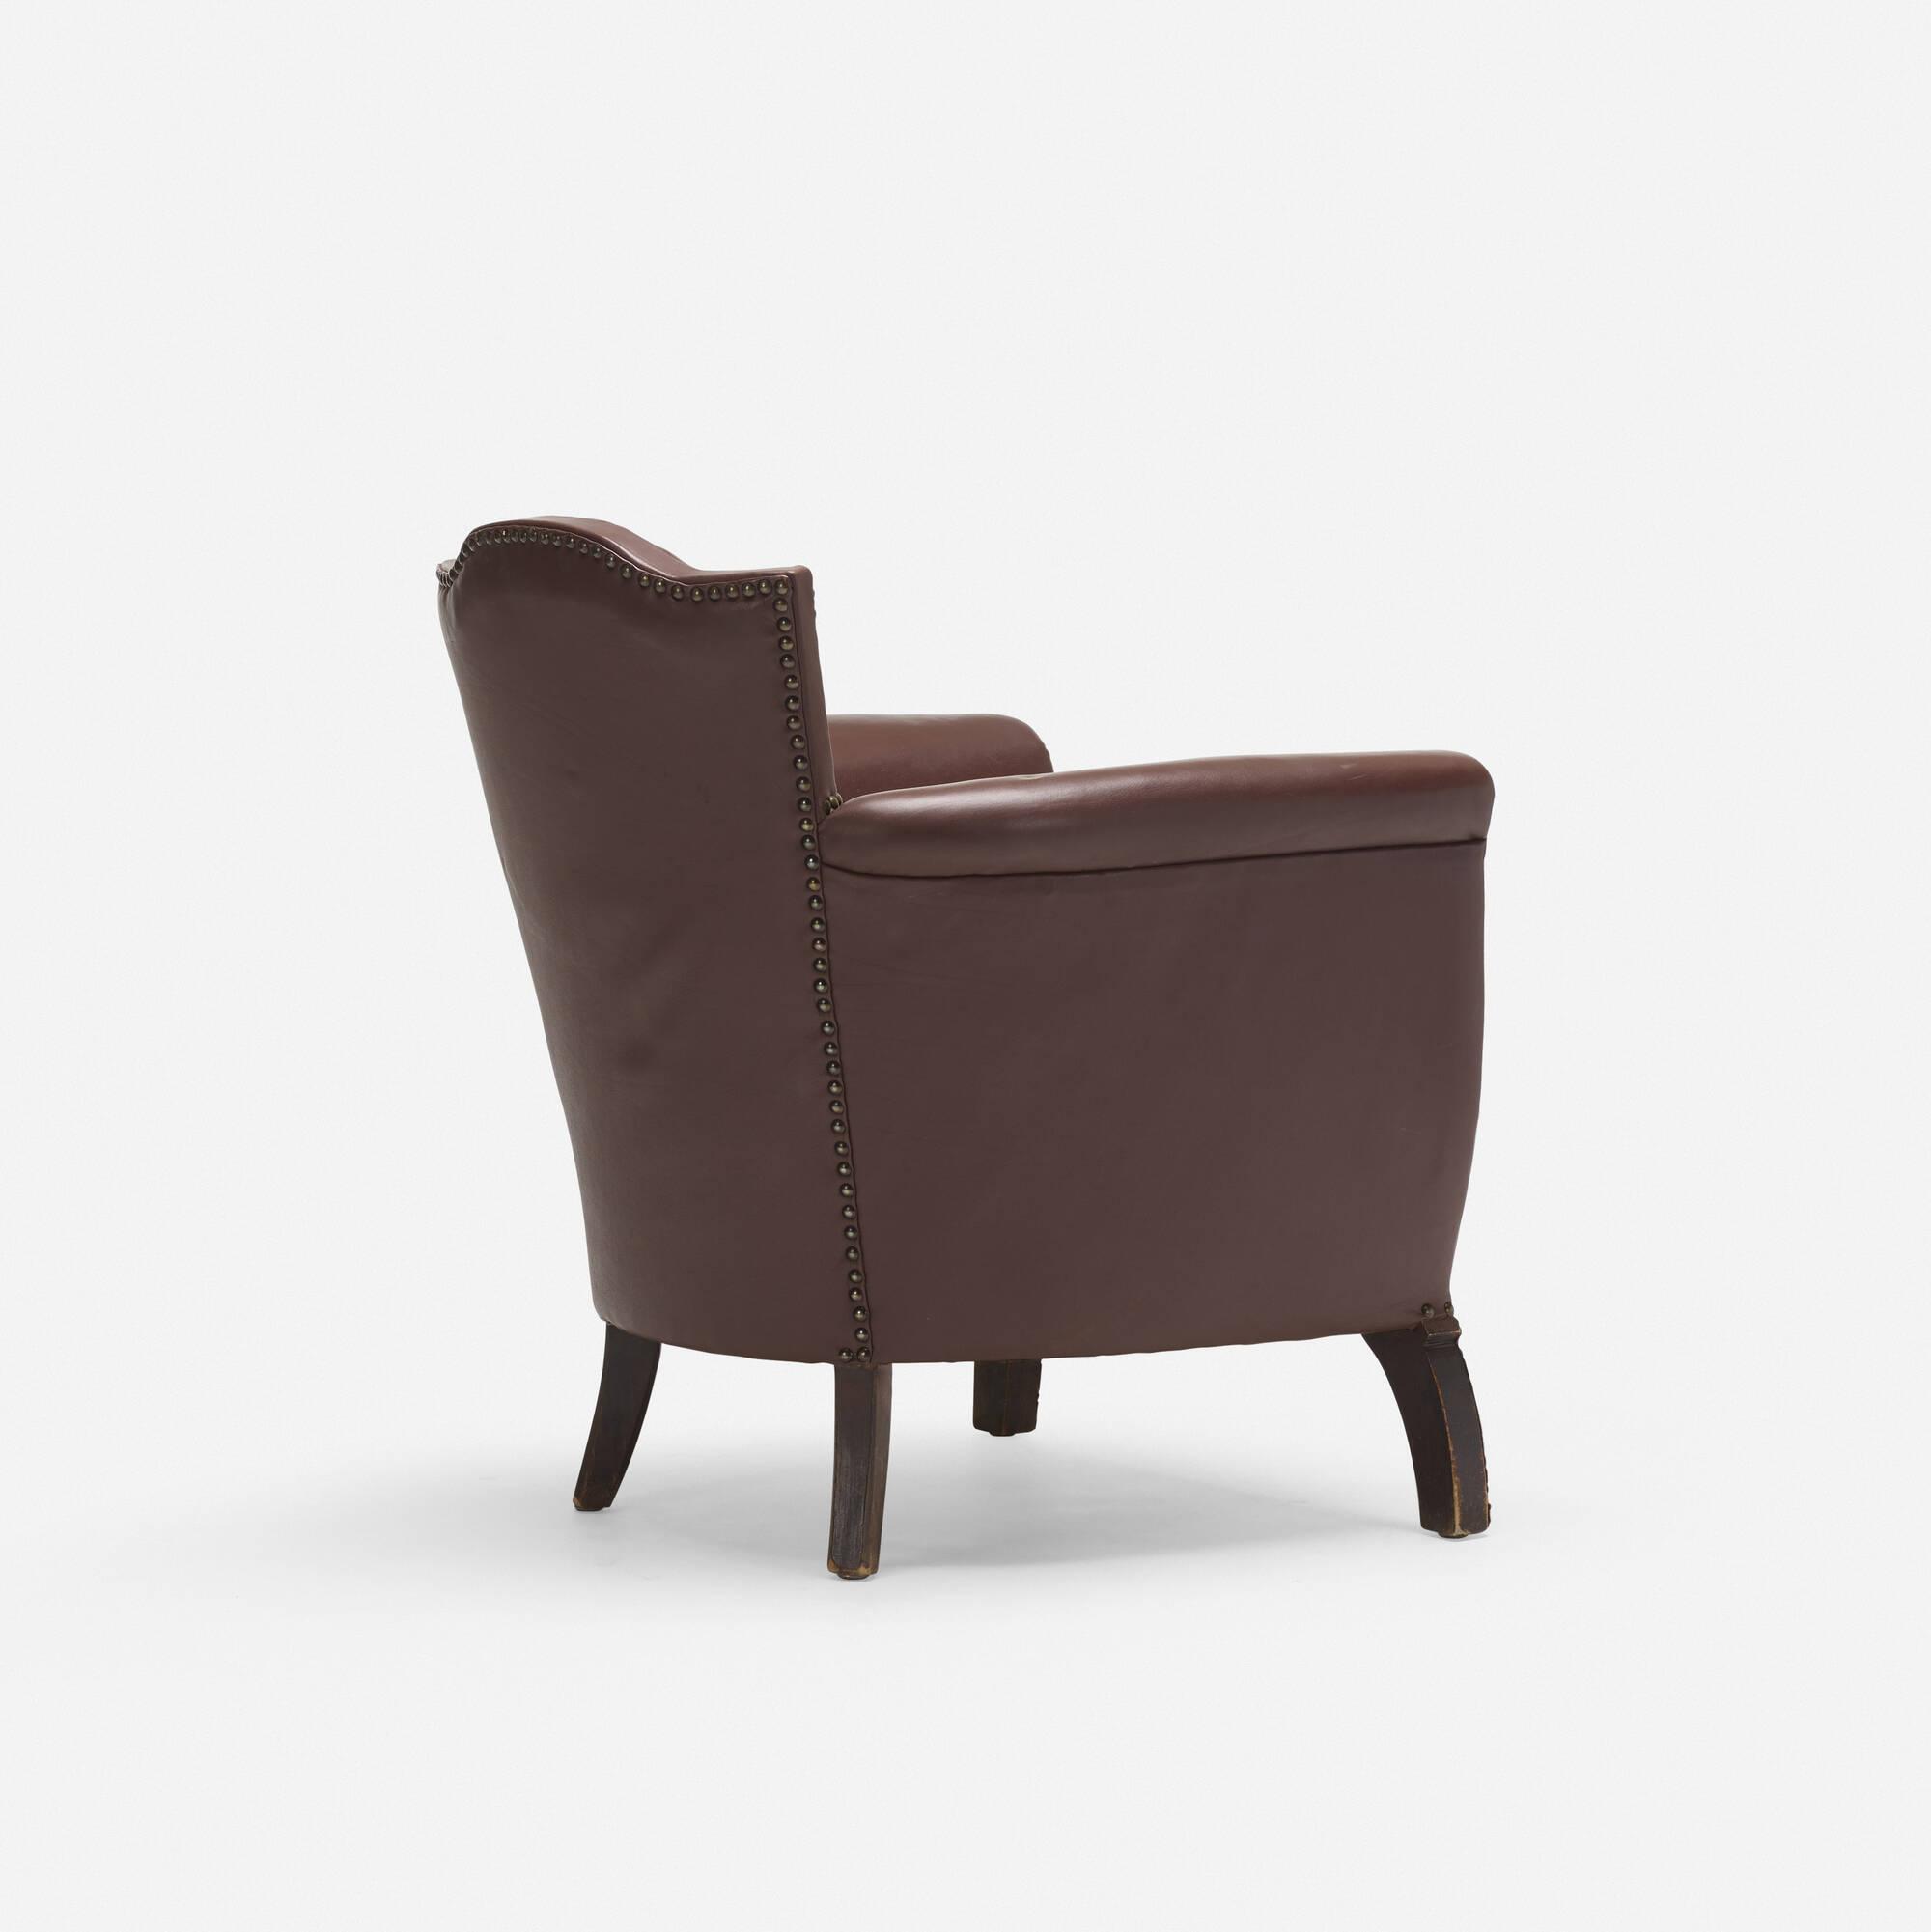 720: Otto Schulz / armchair (2 of 3)